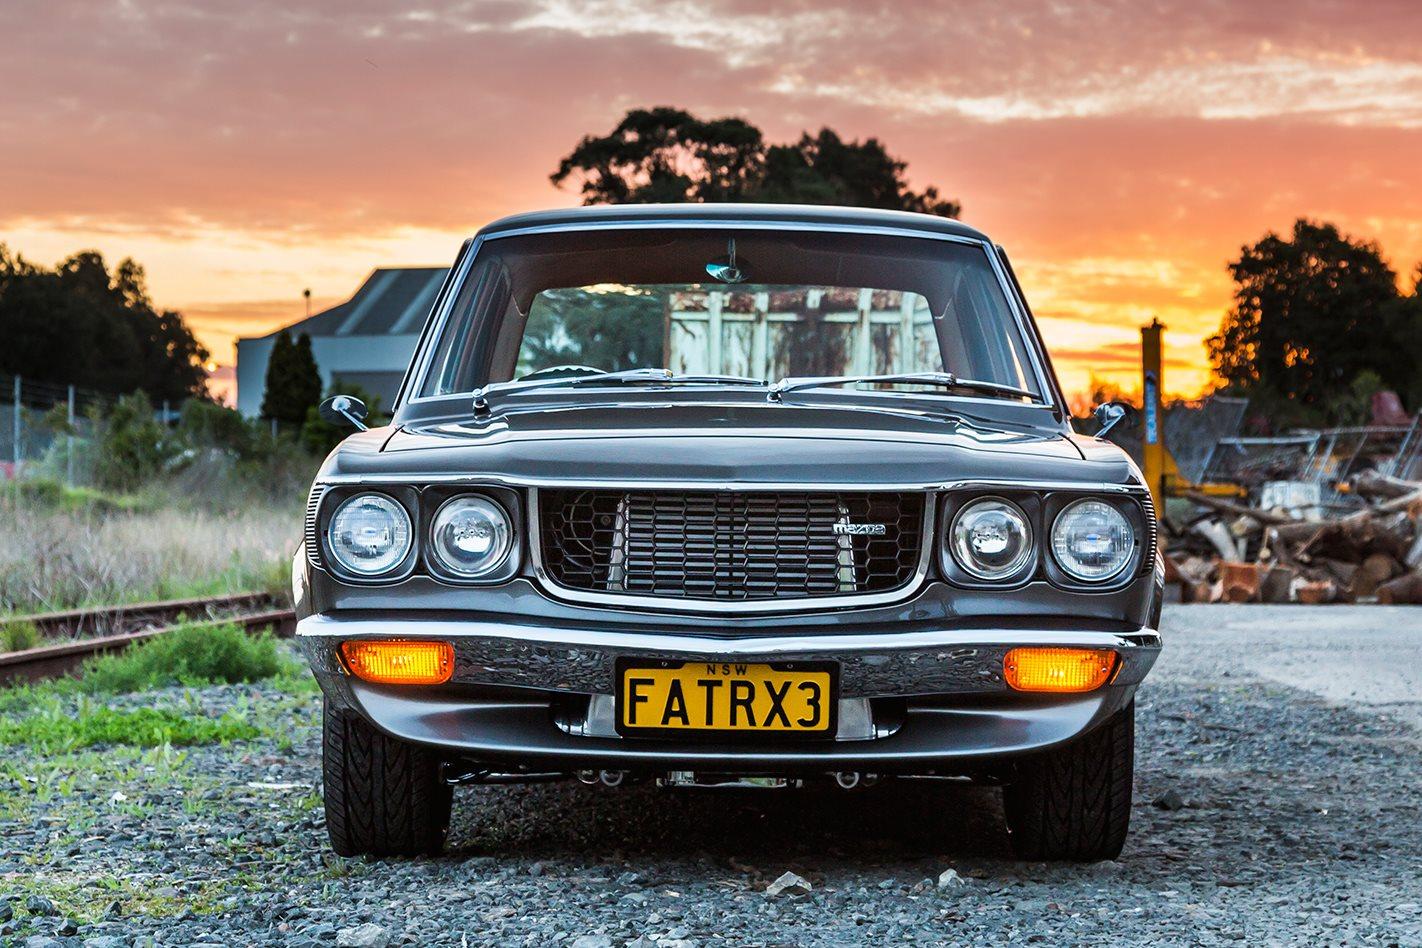 tubbed, turbocharged 13b rotary 1972 mazda rx-3 - fatrx3 | street